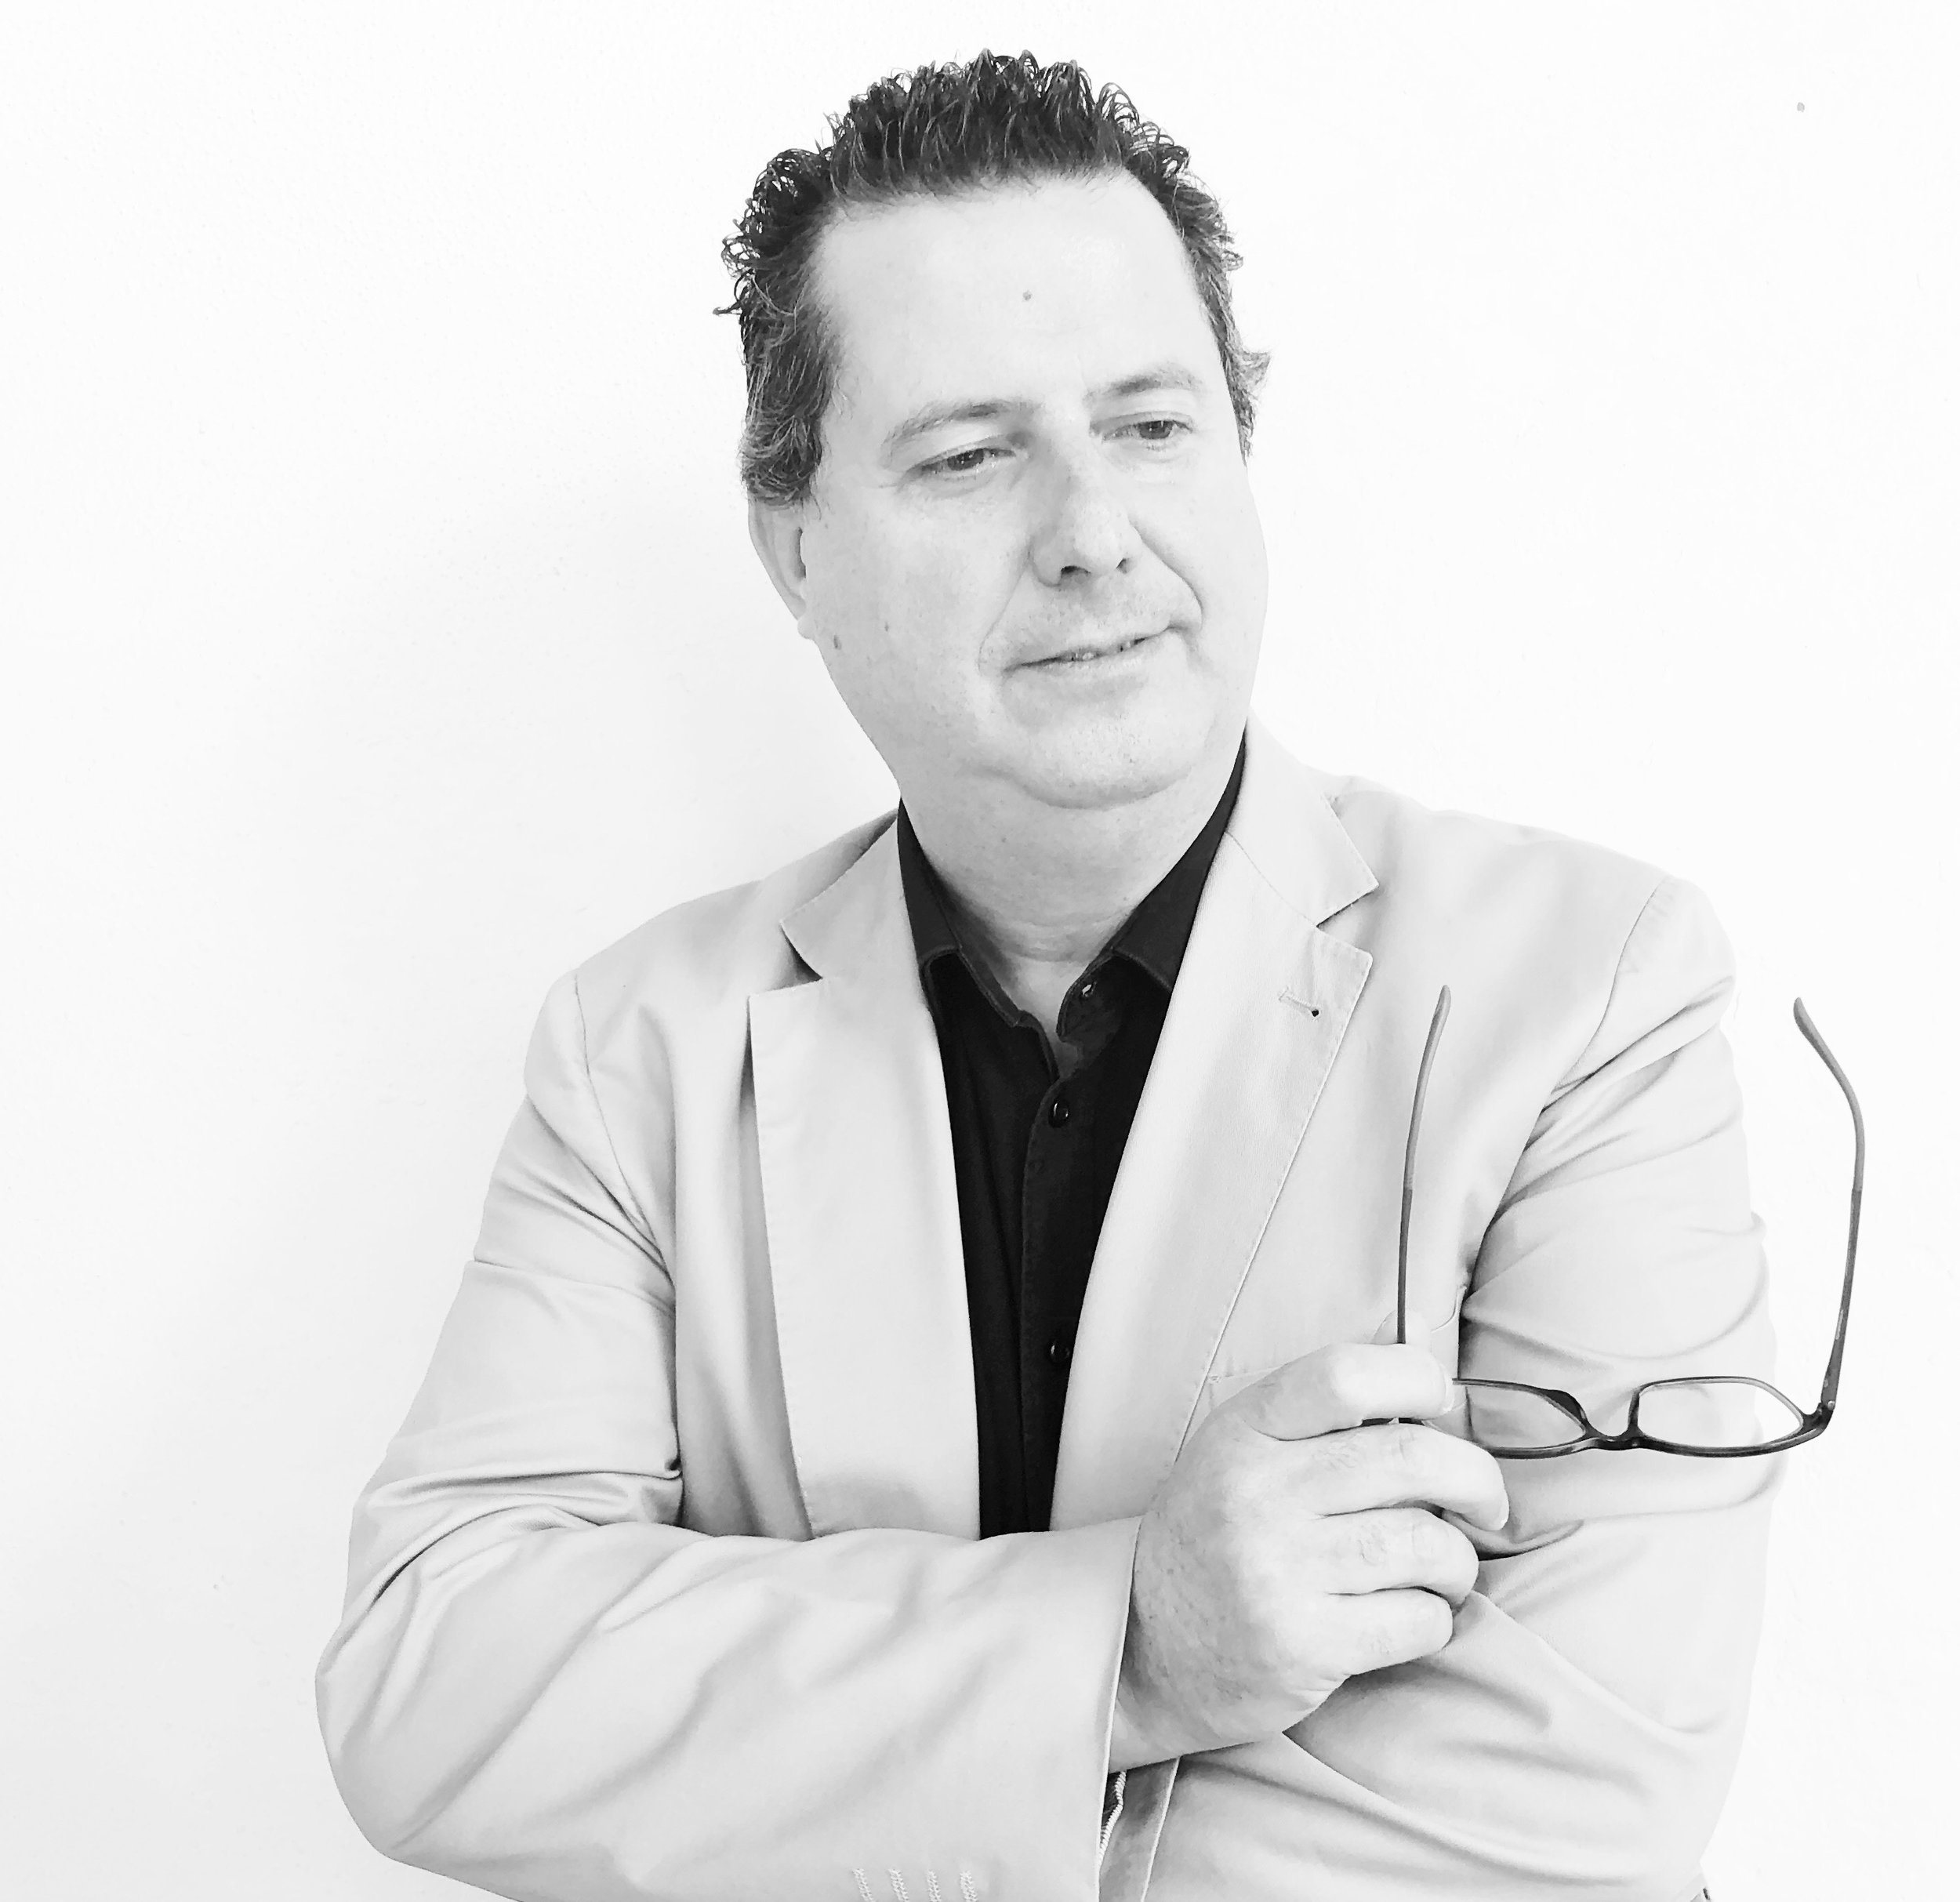 "ESTIUS SIMFONICS - SOLOISTSANDREU RIERA, PIANOPROGRAMPrélude a l'après-midi d'un faune C. Debussy""Noches en los jardines de España"" M.de Falla""Cuatro Estaciones"" A. PiazollaTres danzas españolas E. Granados"